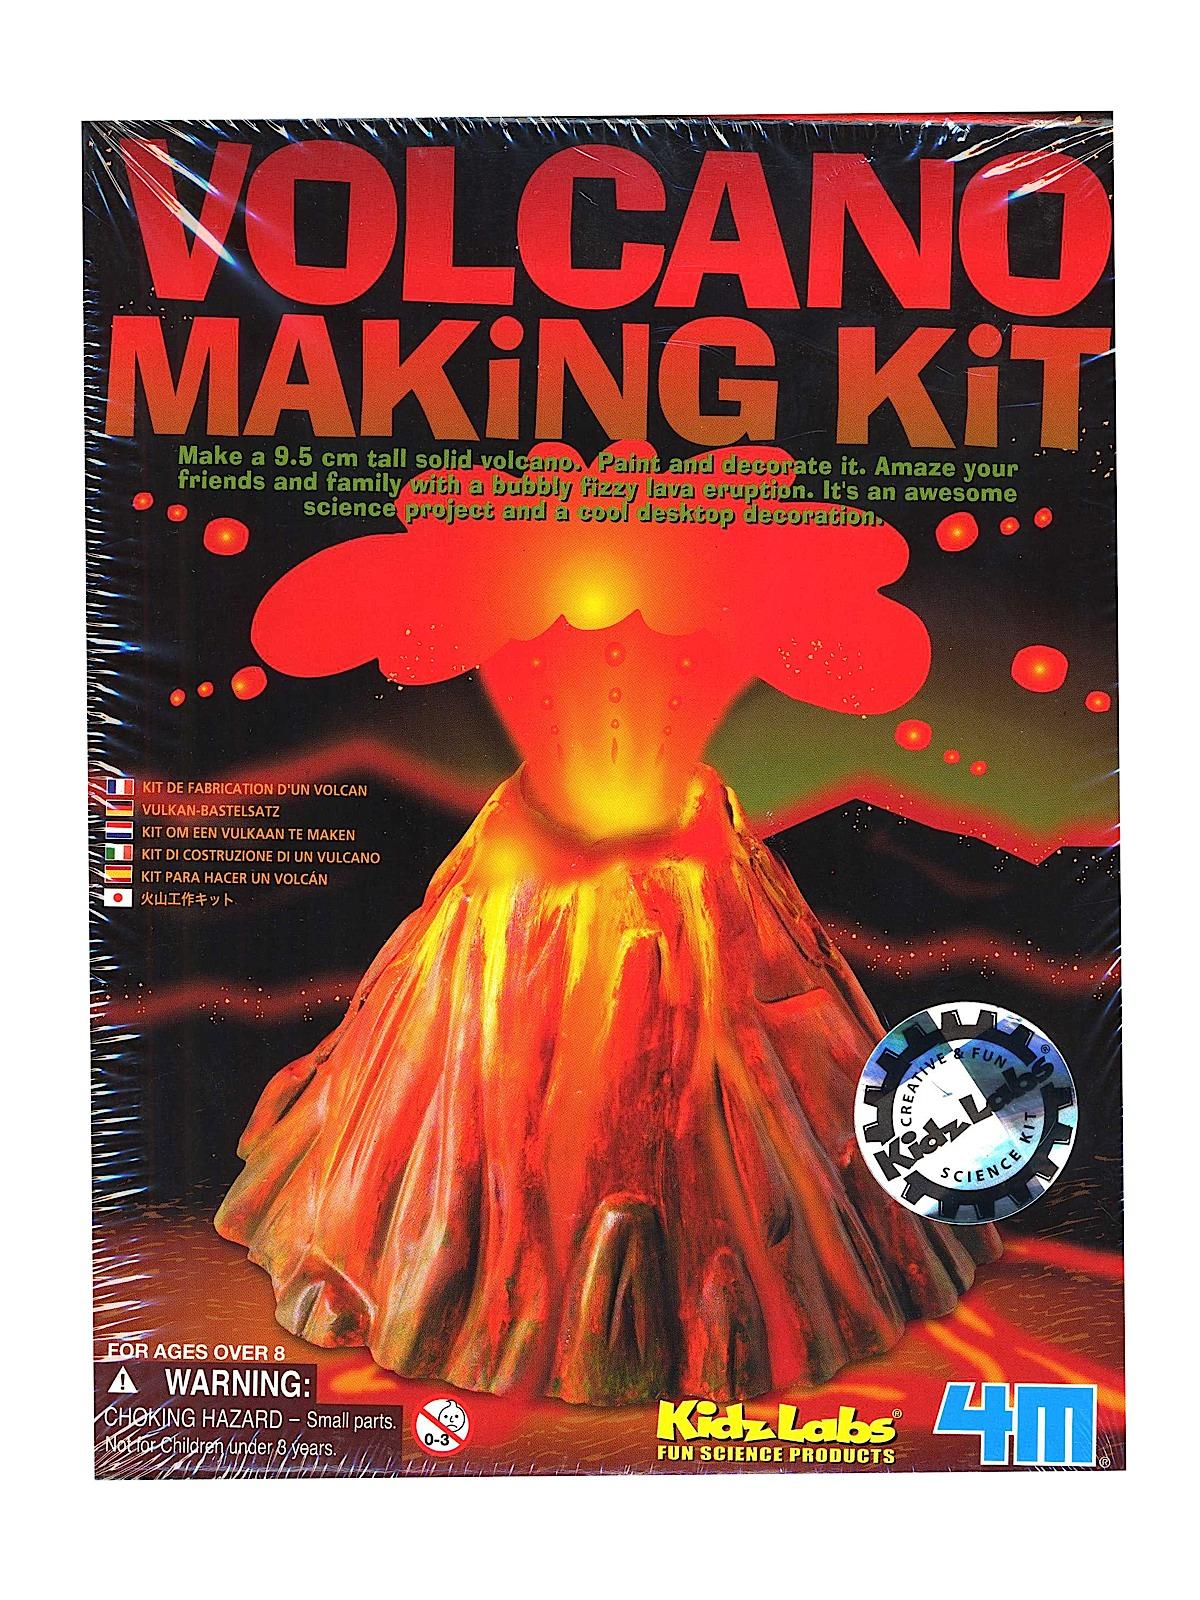 4m volcano making kit instructions